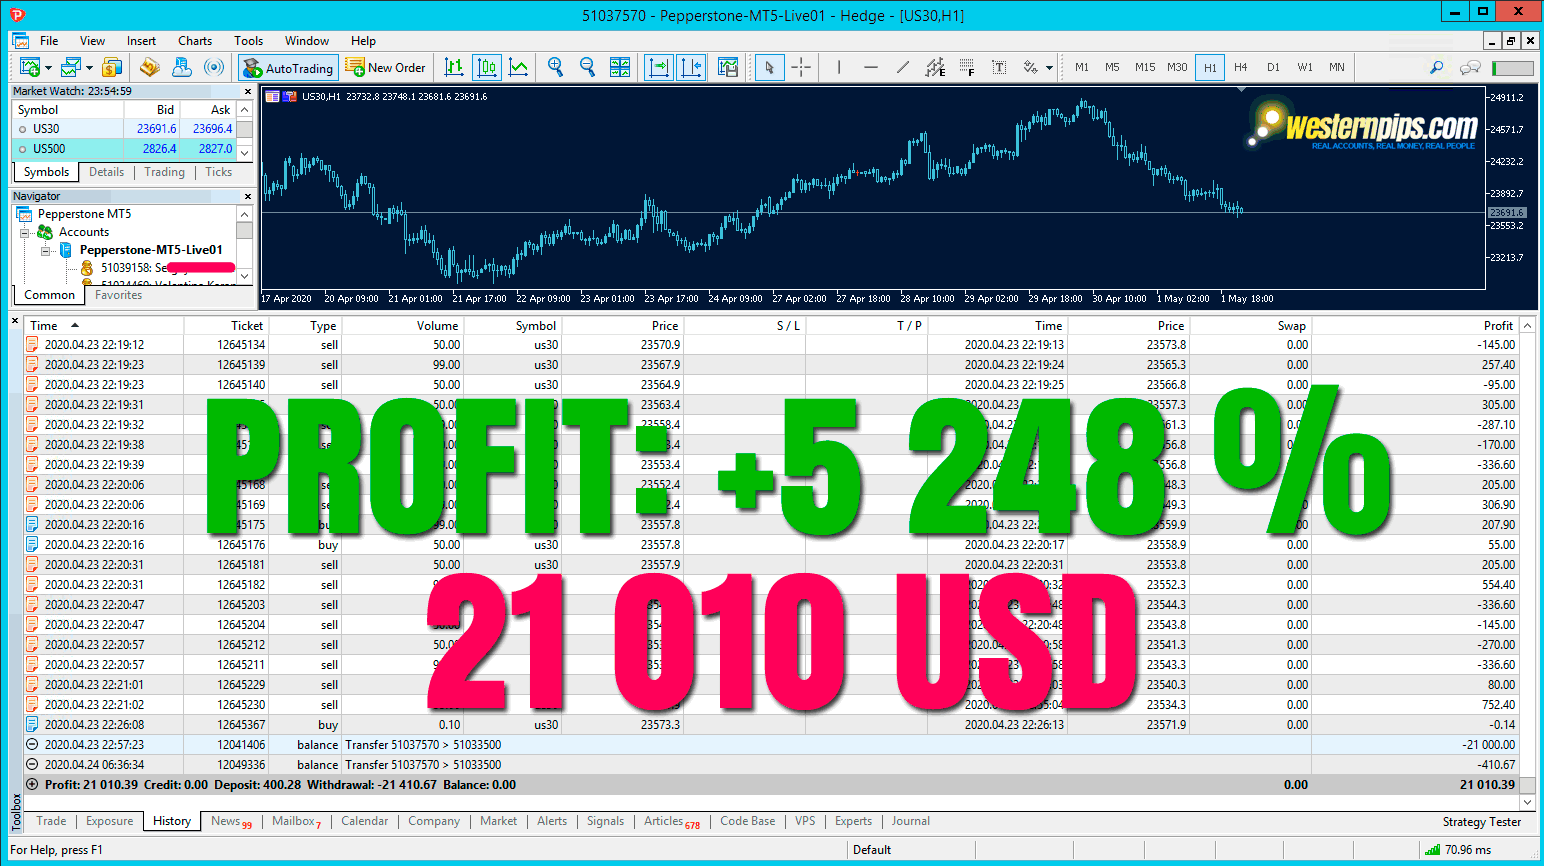 masalah penarikan paxforex video cara menambahkan indicator trading di iq option